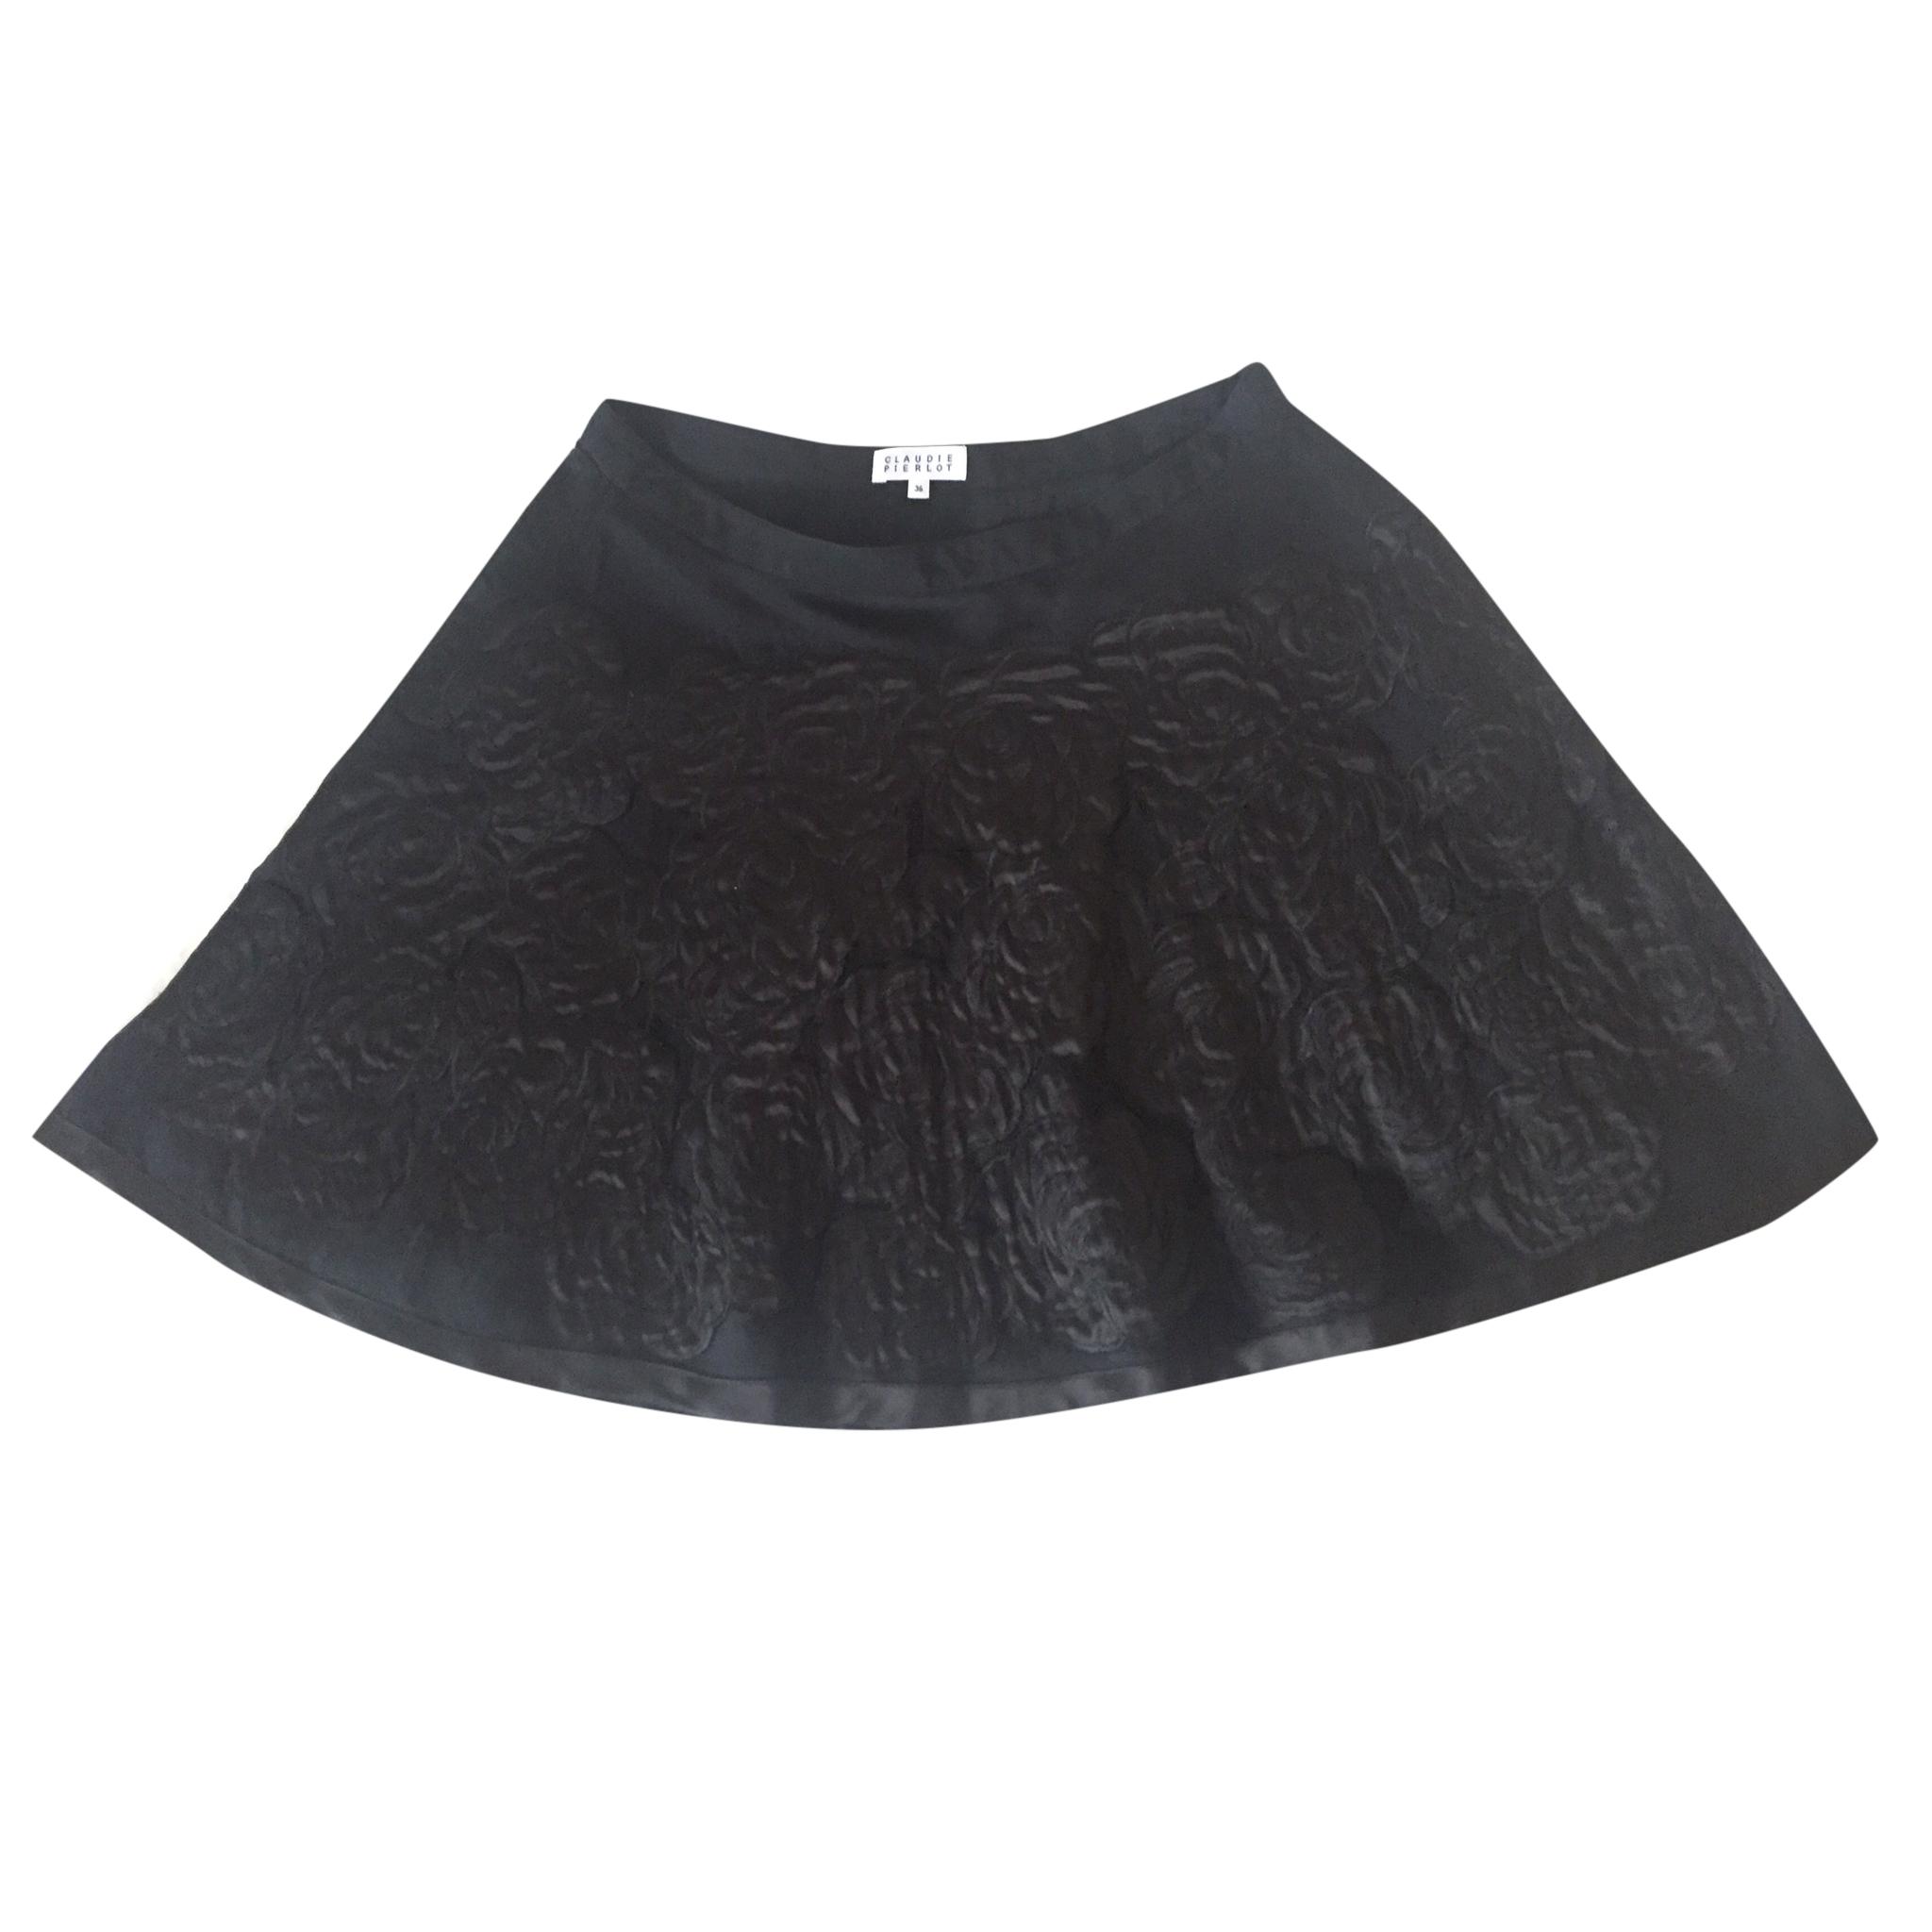 Claudie Pierlot Black Mini Skirt